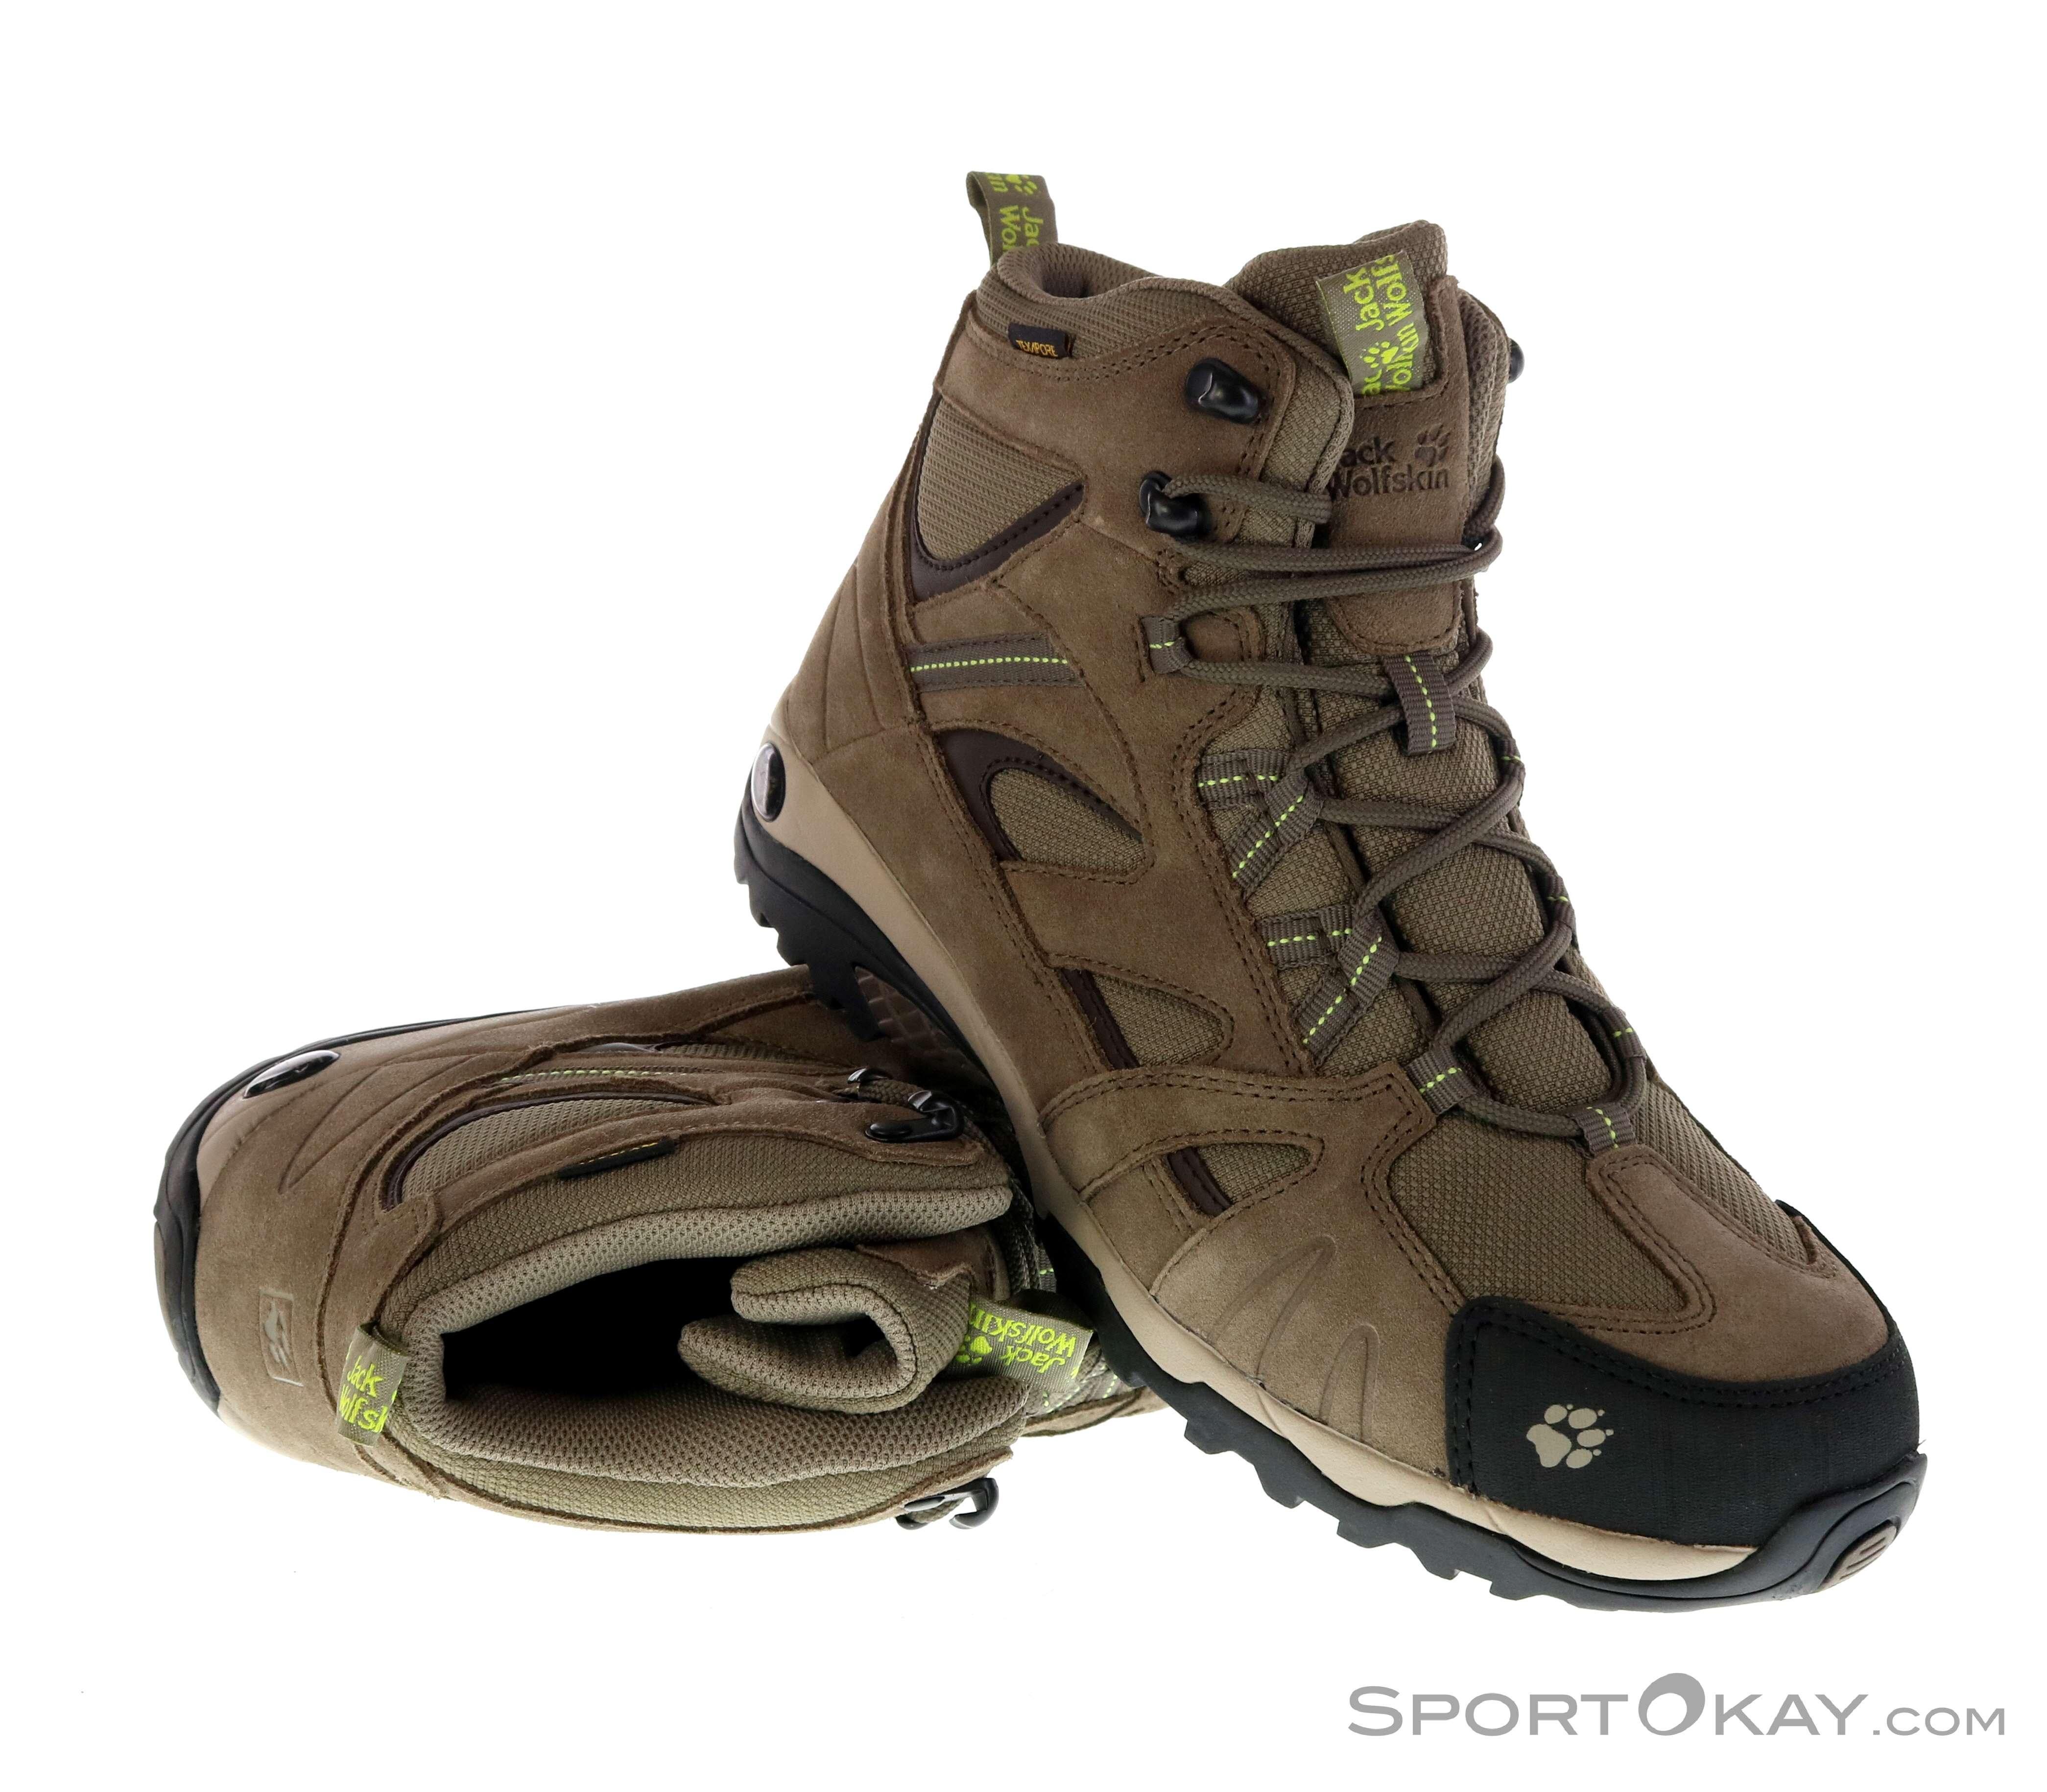 jack wolfskin boots texaco3re